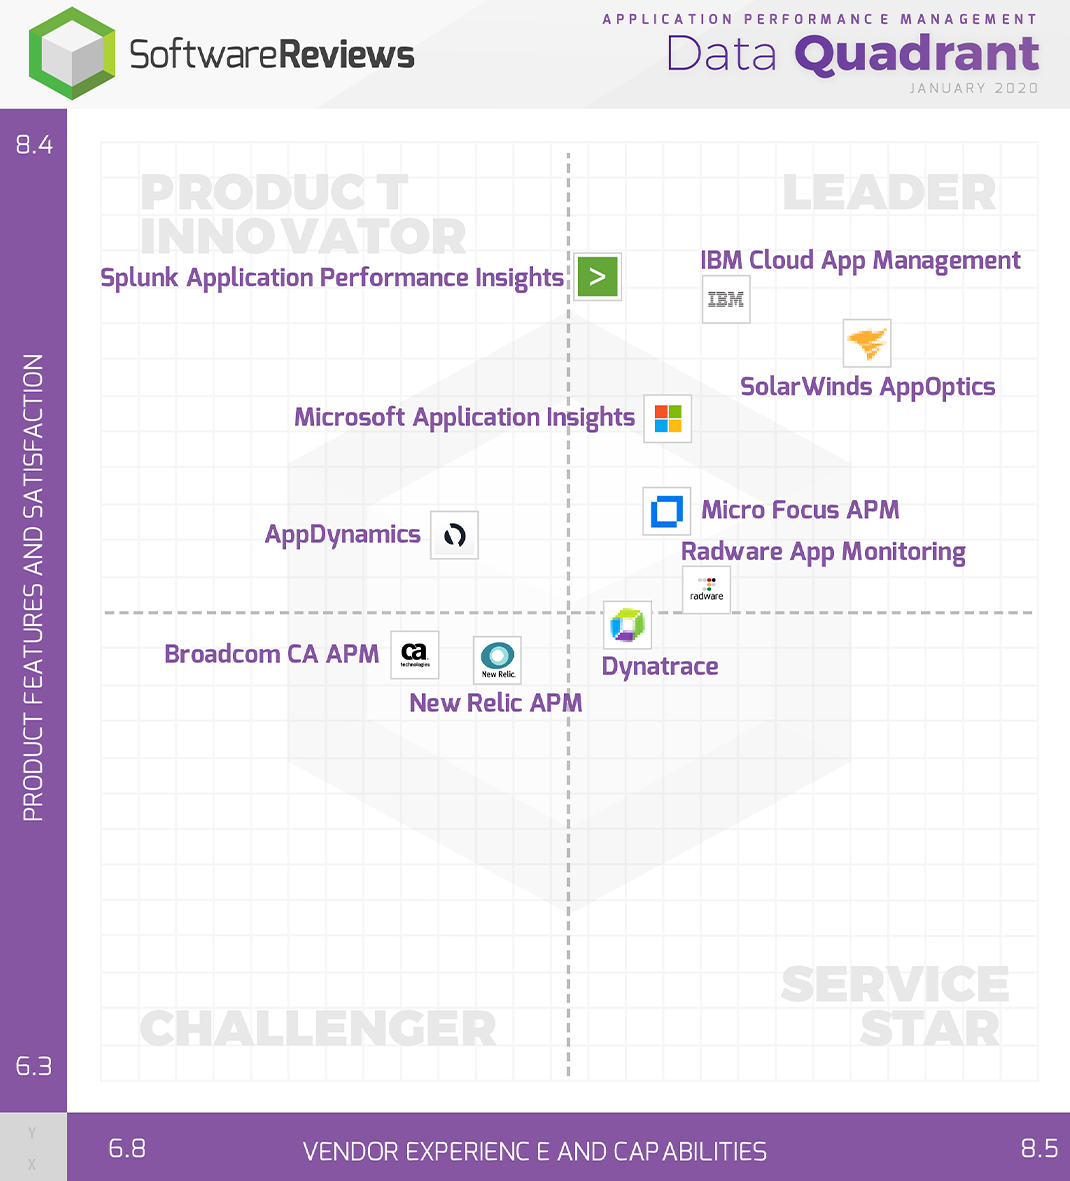 Application Performance Management Data Quadrant